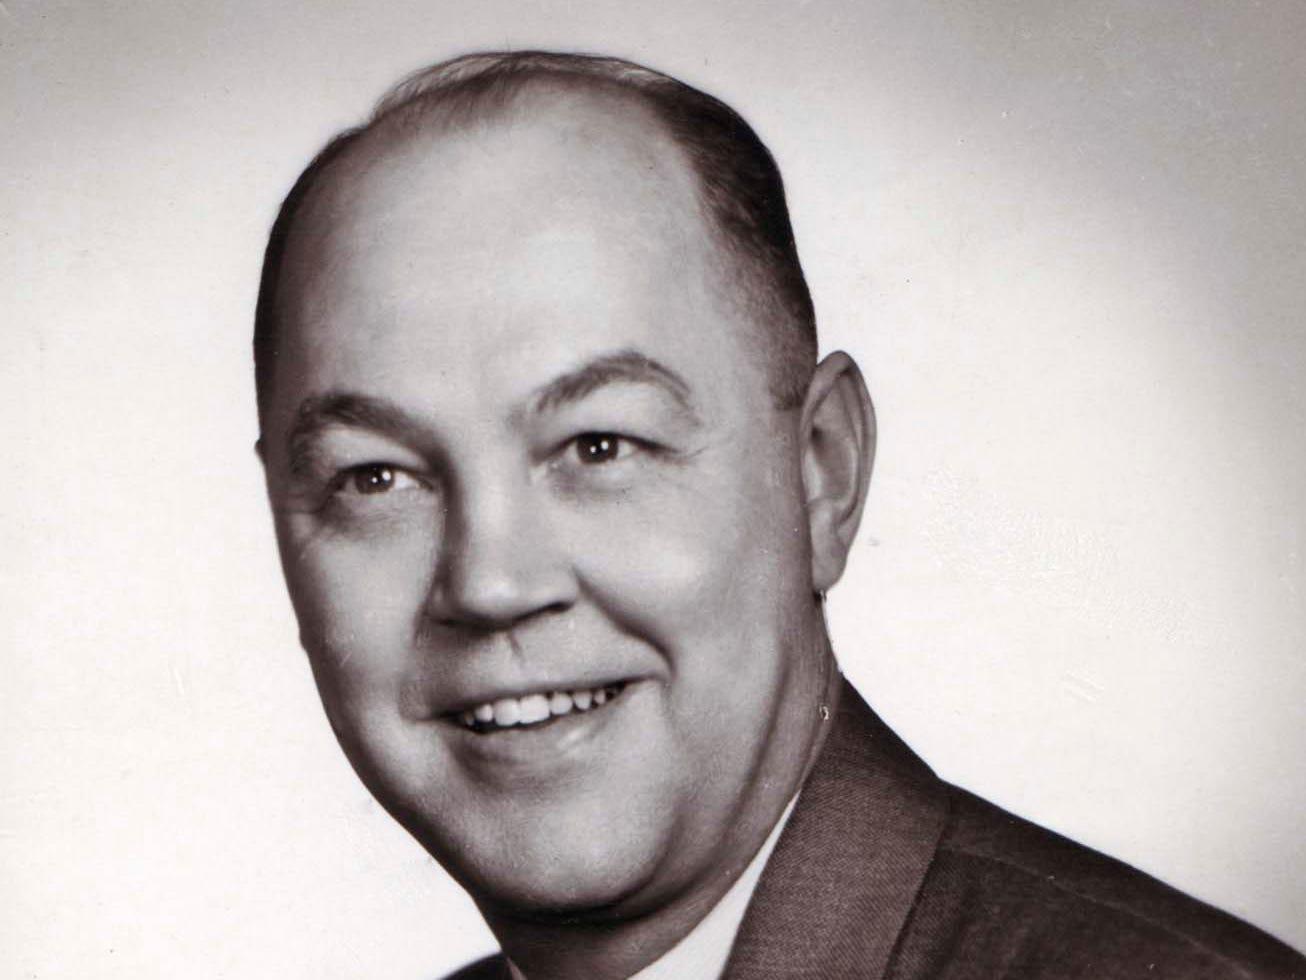 Sheboygan Redskins Coach Frank Zummach circa 1940